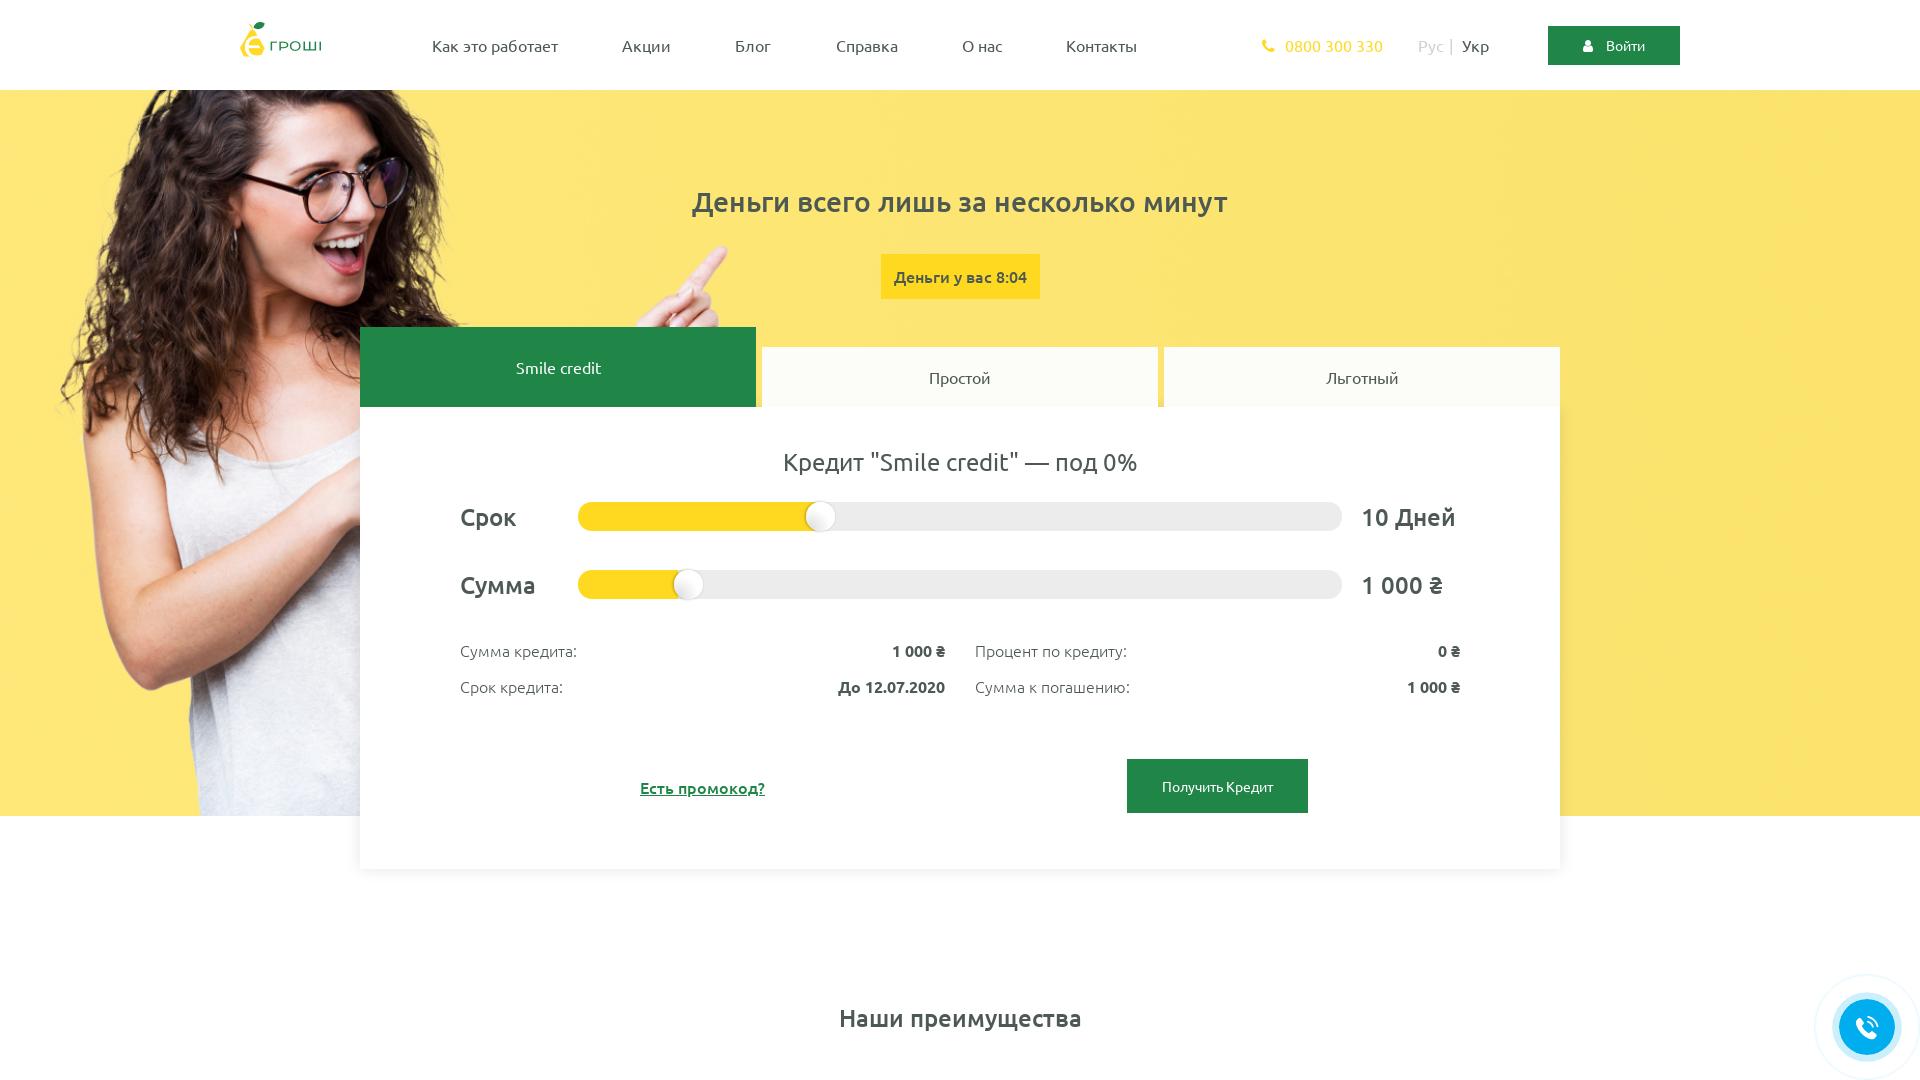 Е-Гроши [CPS] UA website